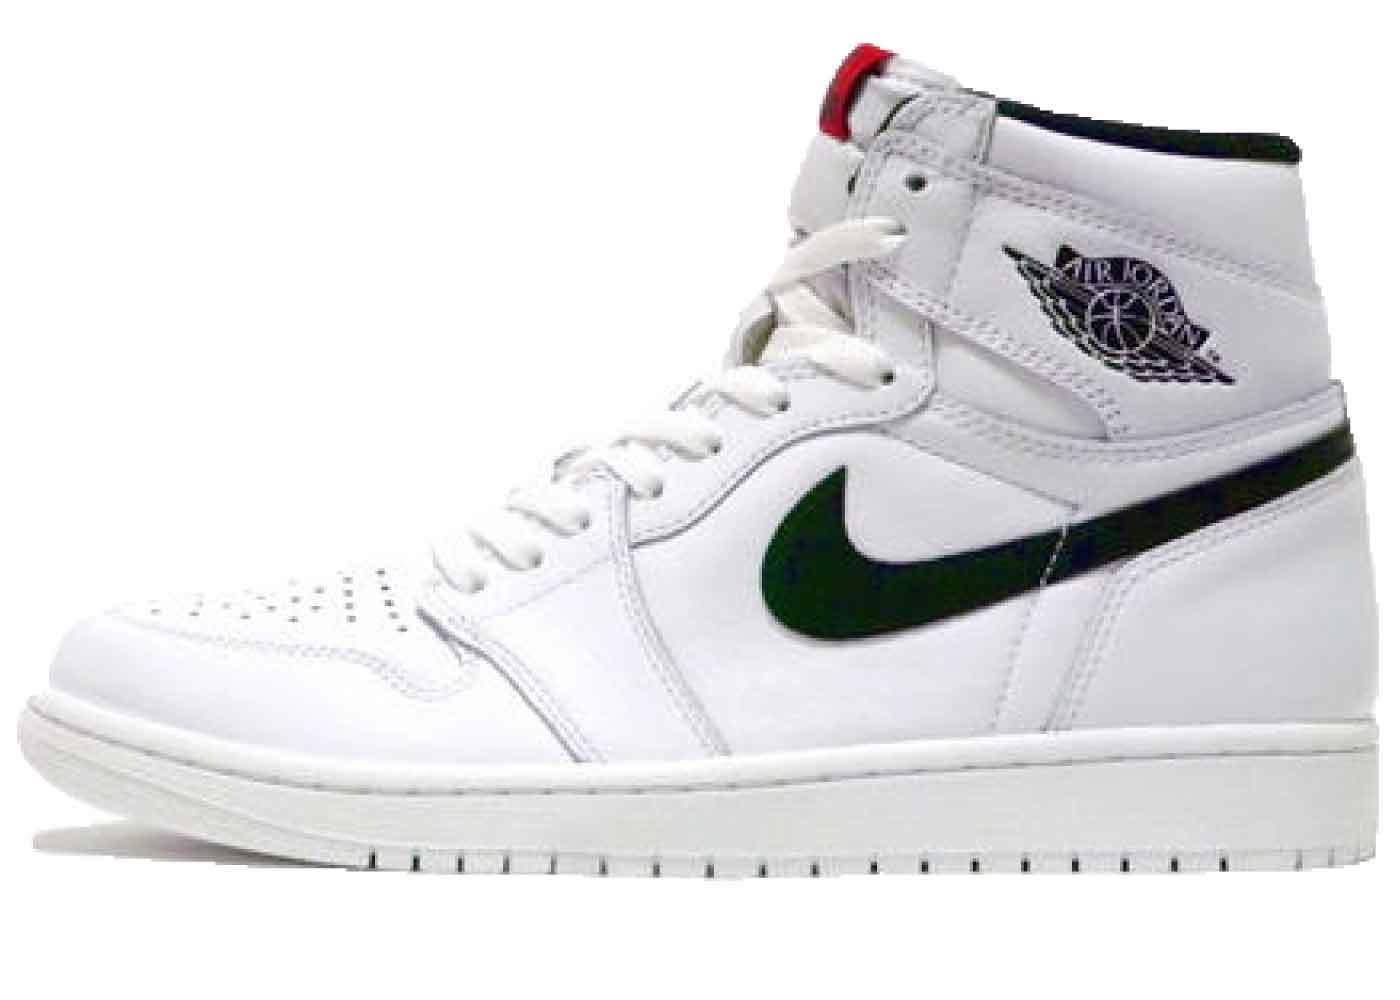 Nike Air Jordan 1 Retro Yin Yang Whiteの写真